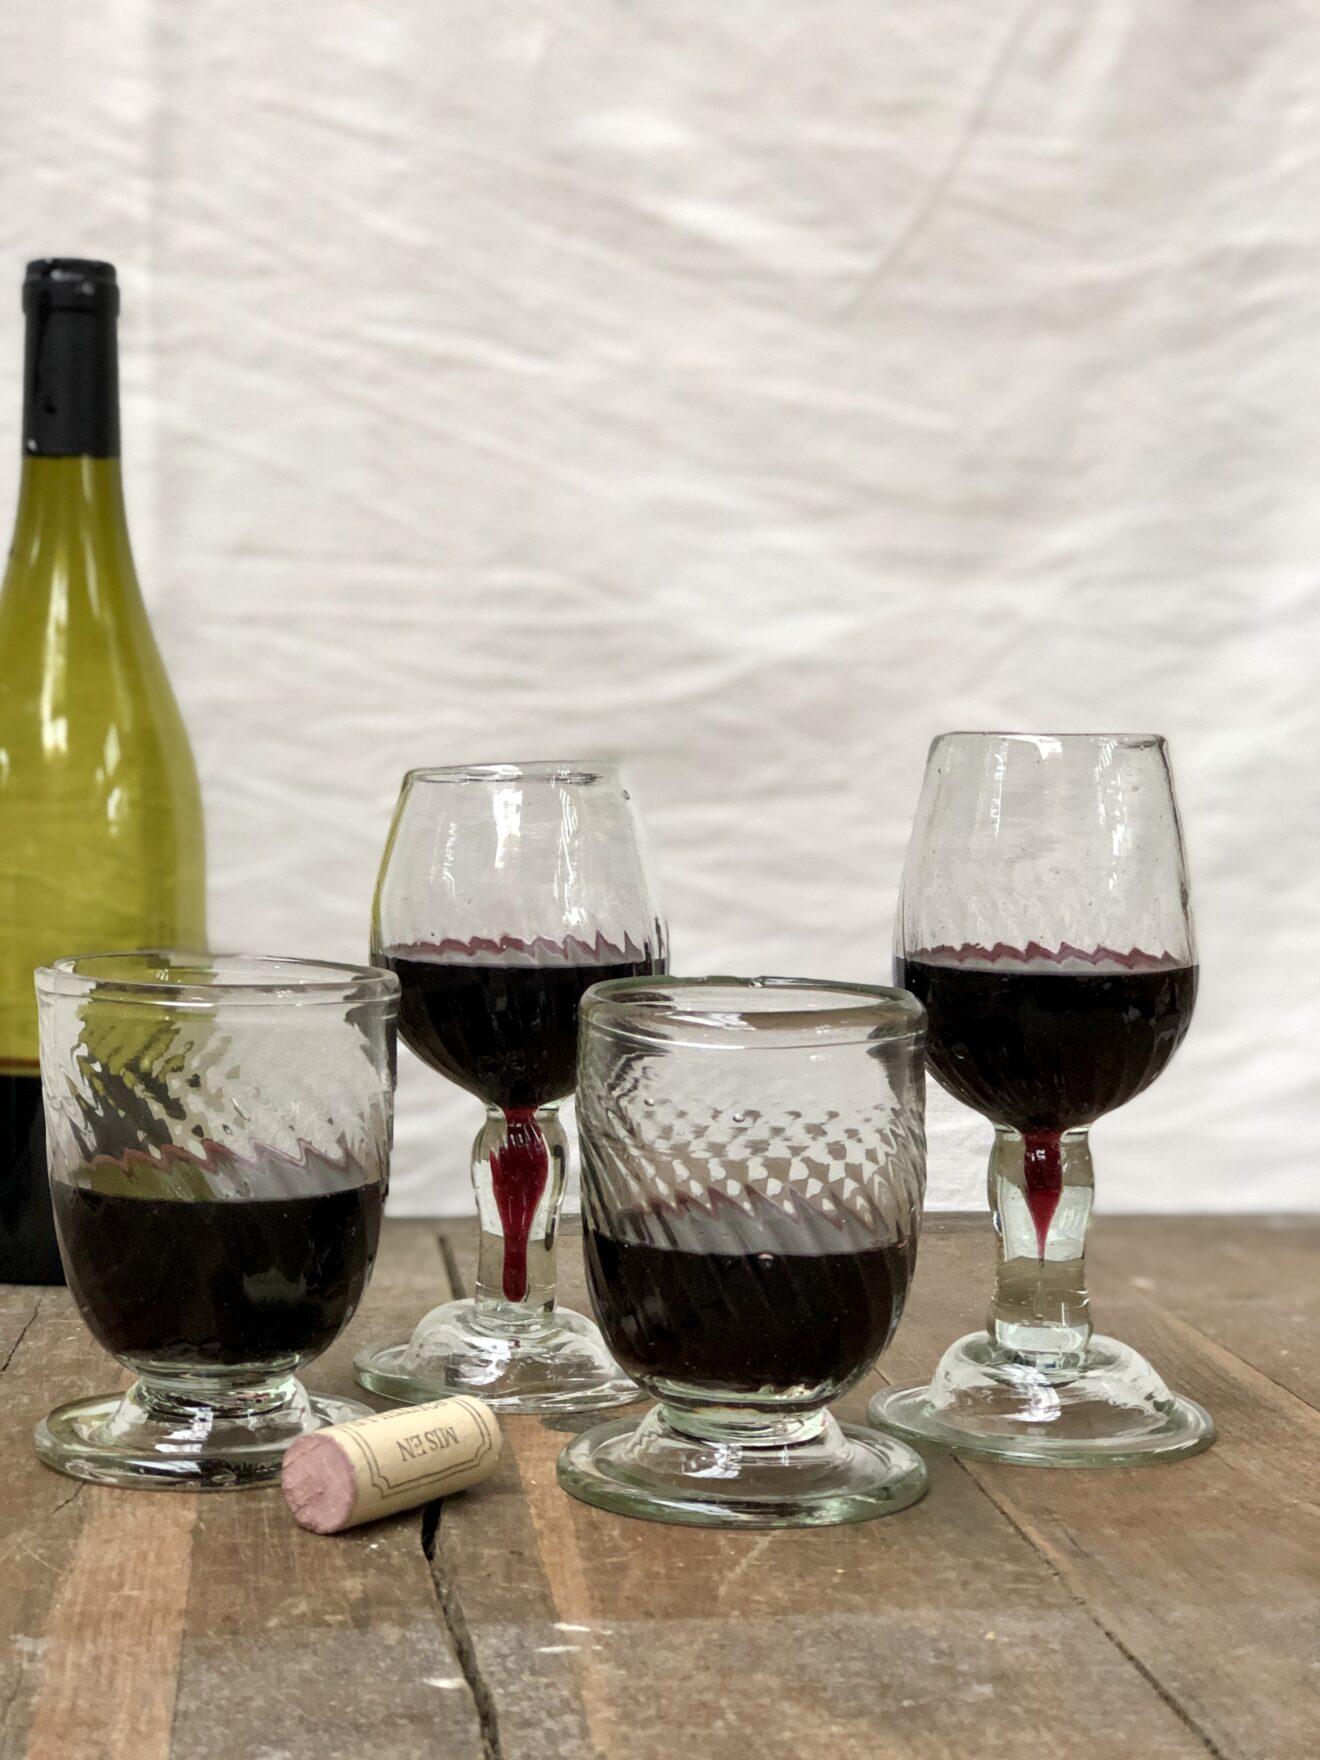 la-soufflerie-vino-venezia-corvina-wine-glasses-transparent-hand-blown-recycled-glass